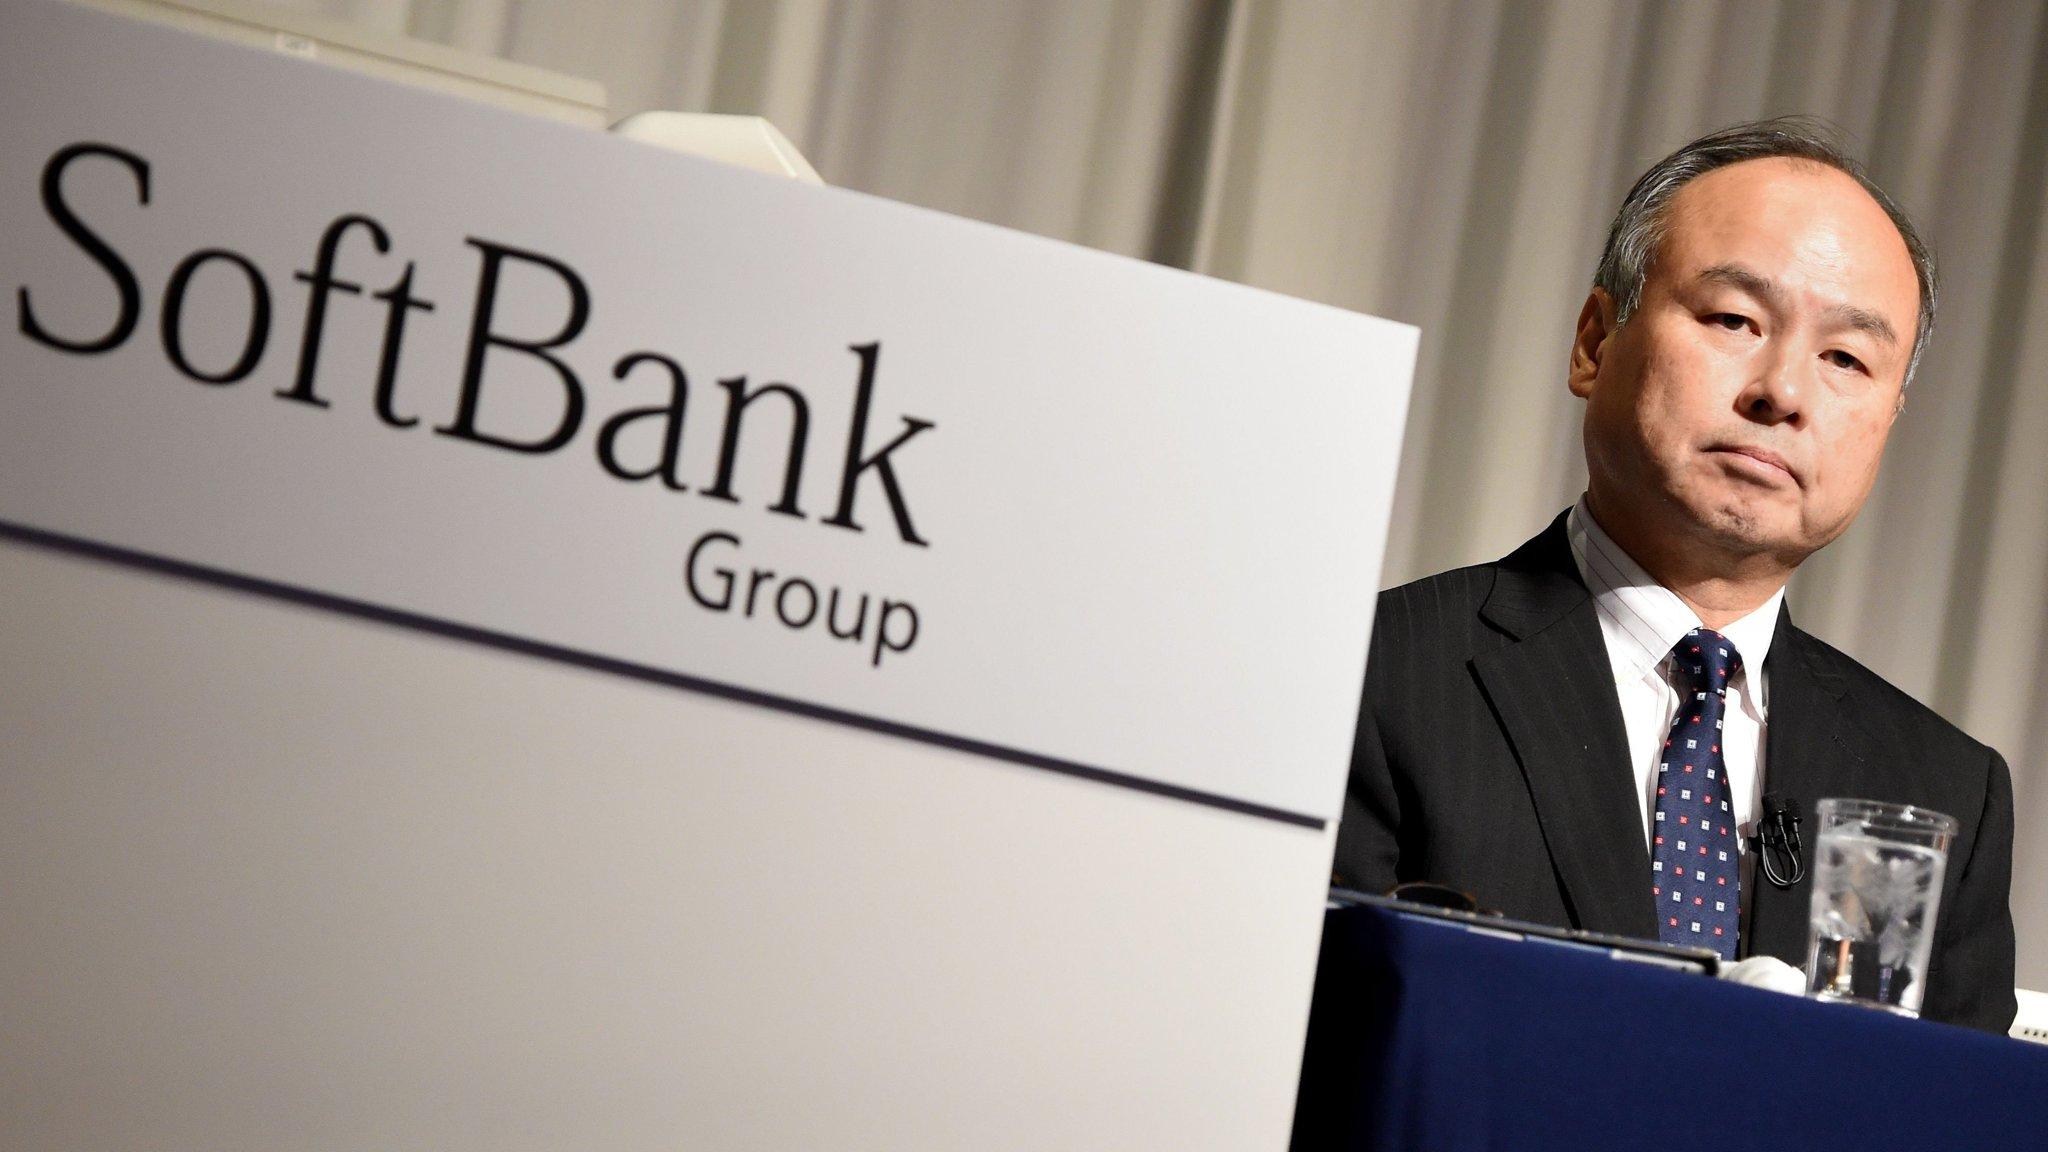 Beware SoftBank's investment behemoth | Financial Times